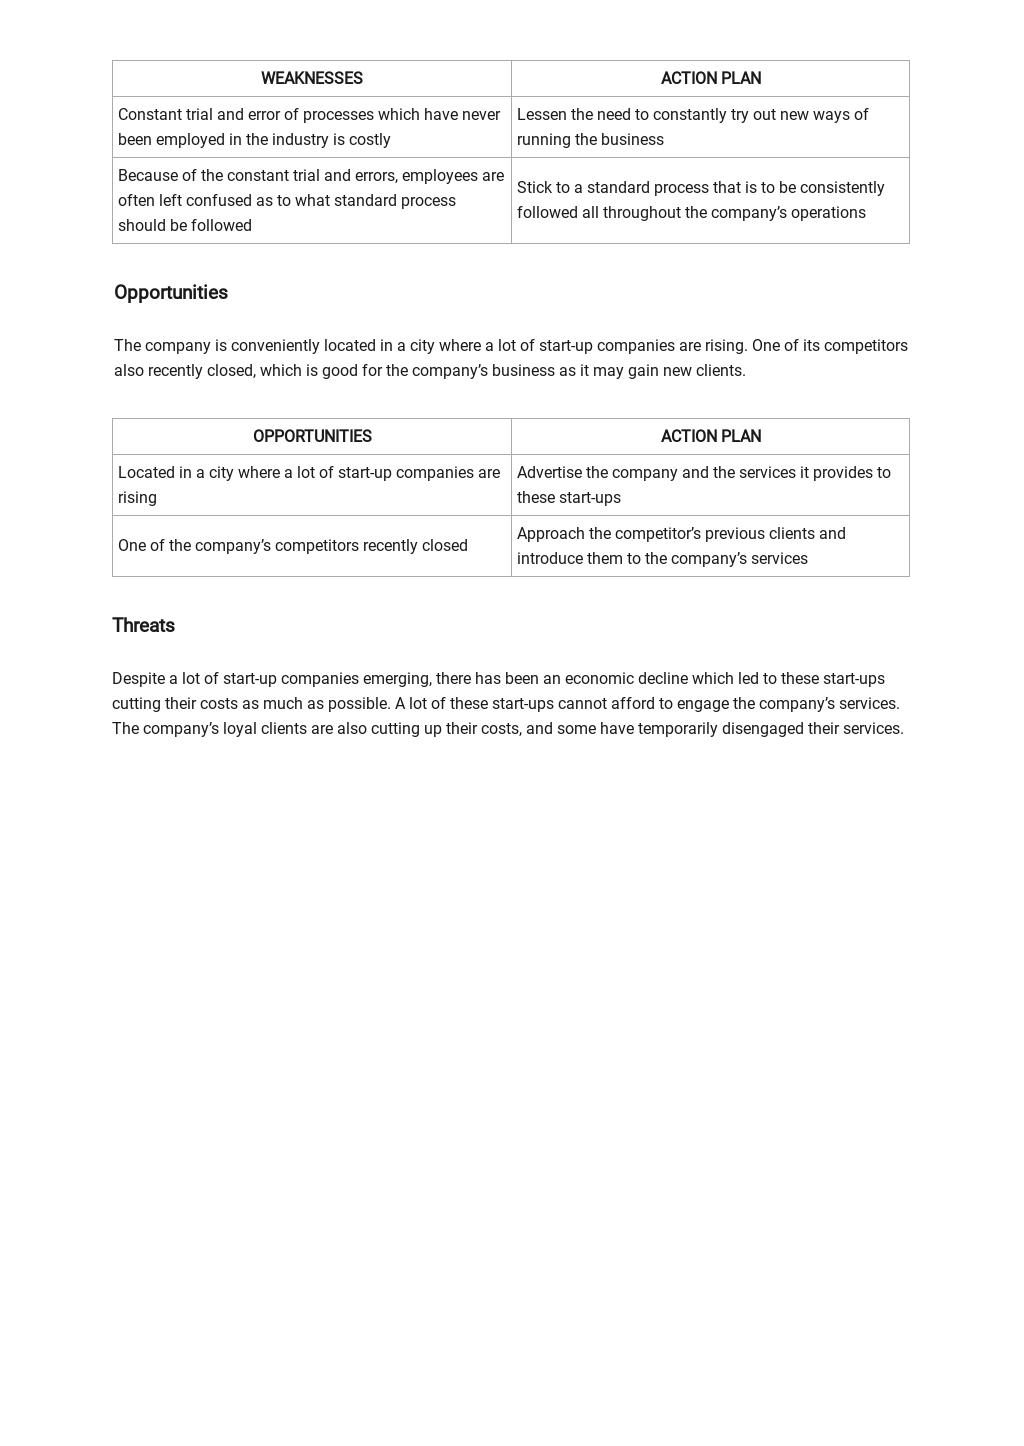 Free Editable IT Swot Analysis Template 2.jpe